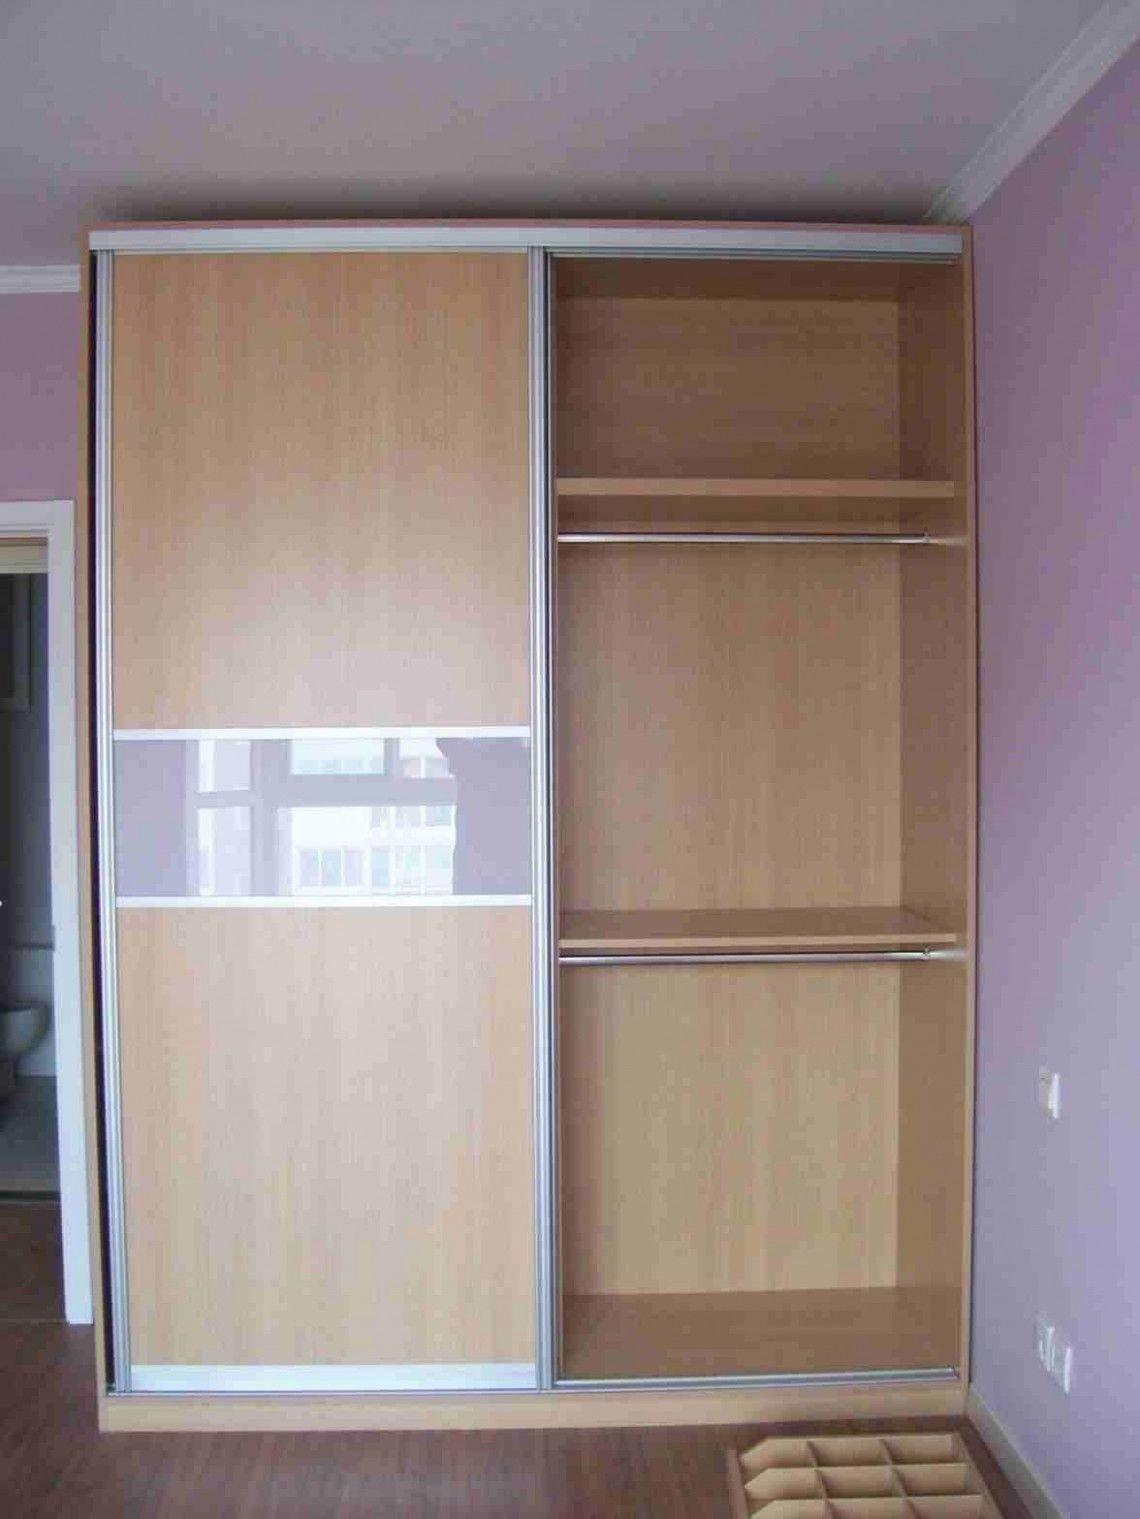 Small Wooden Bedroom Cabinet Design Cupboard Design Bedroom Cabinets Cabinet Design Cupboard for small bedrooms